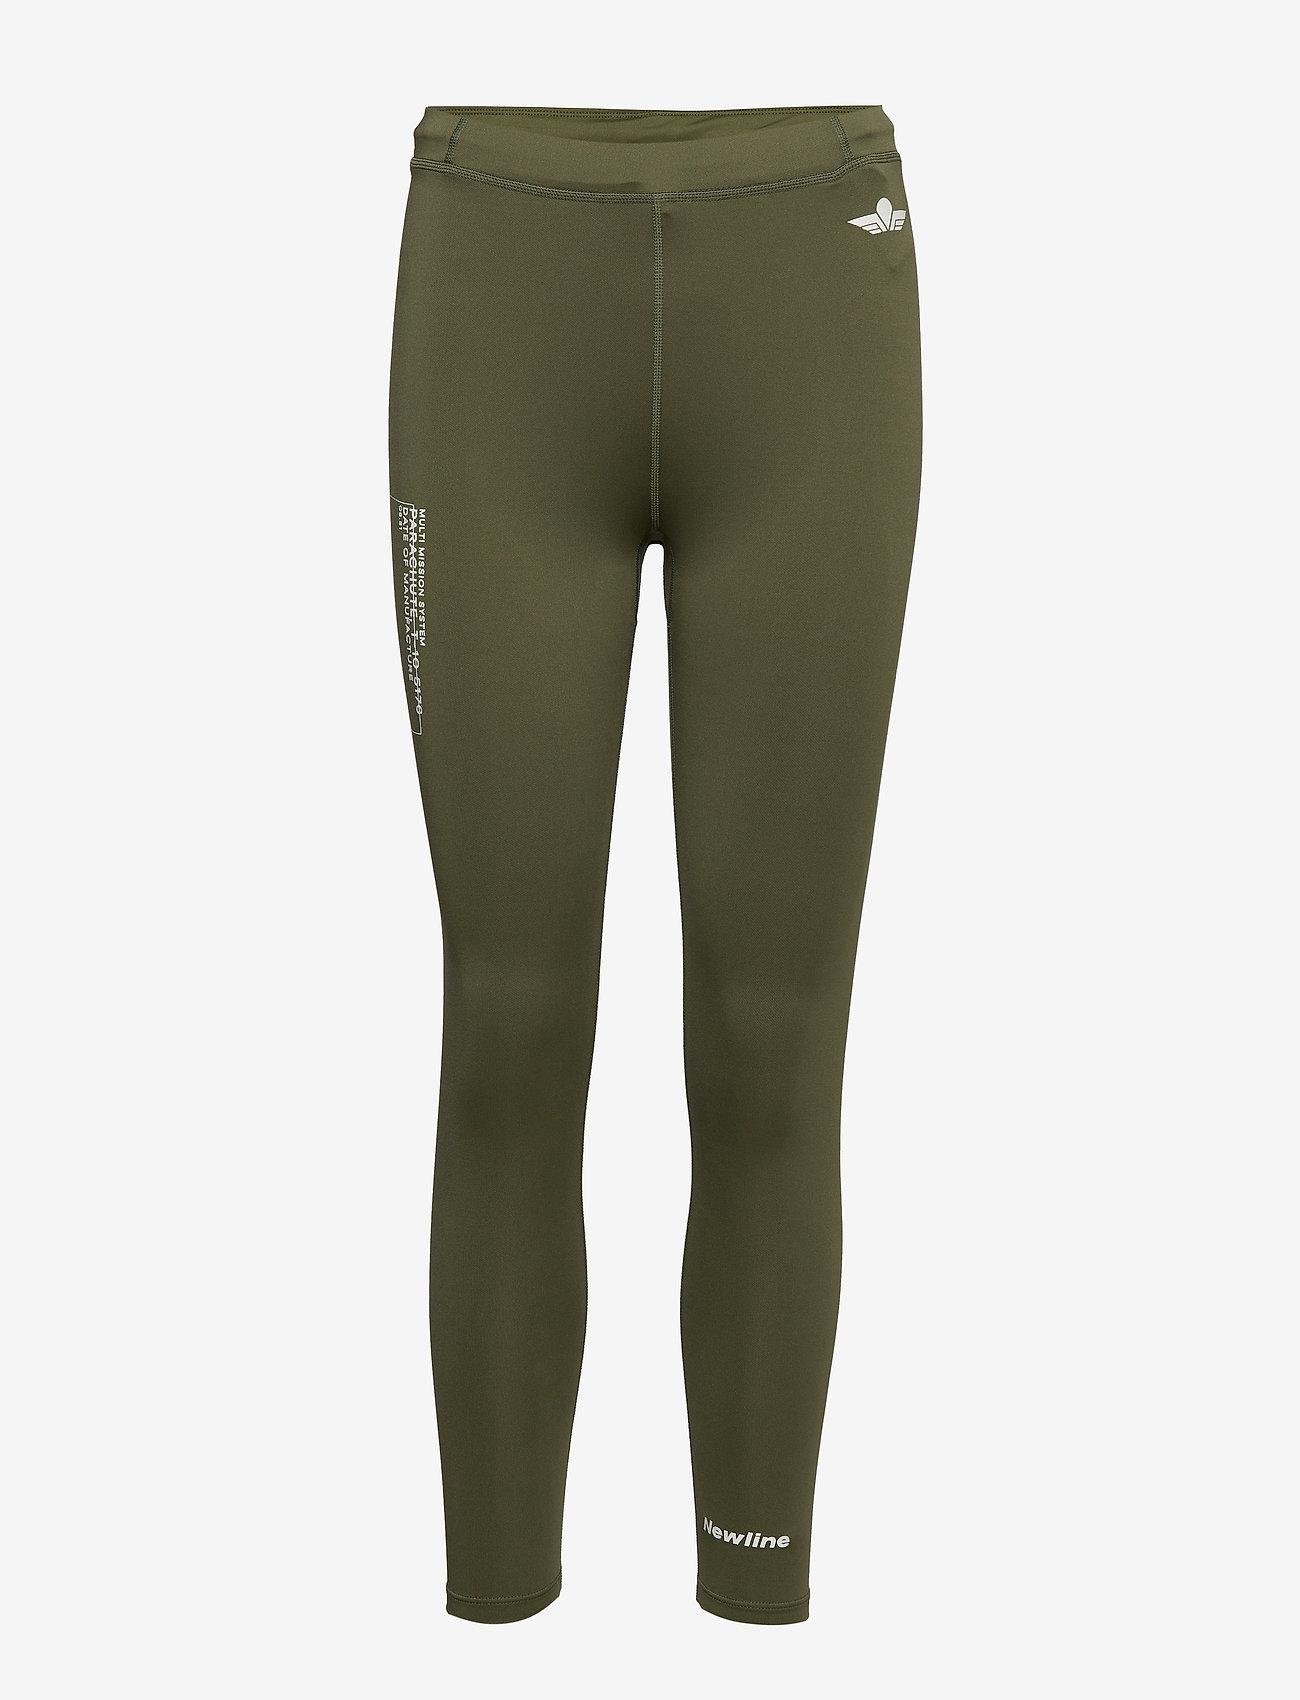 Newline - BLACK 7/8 TIGHTS - running & training tights - para green - 0